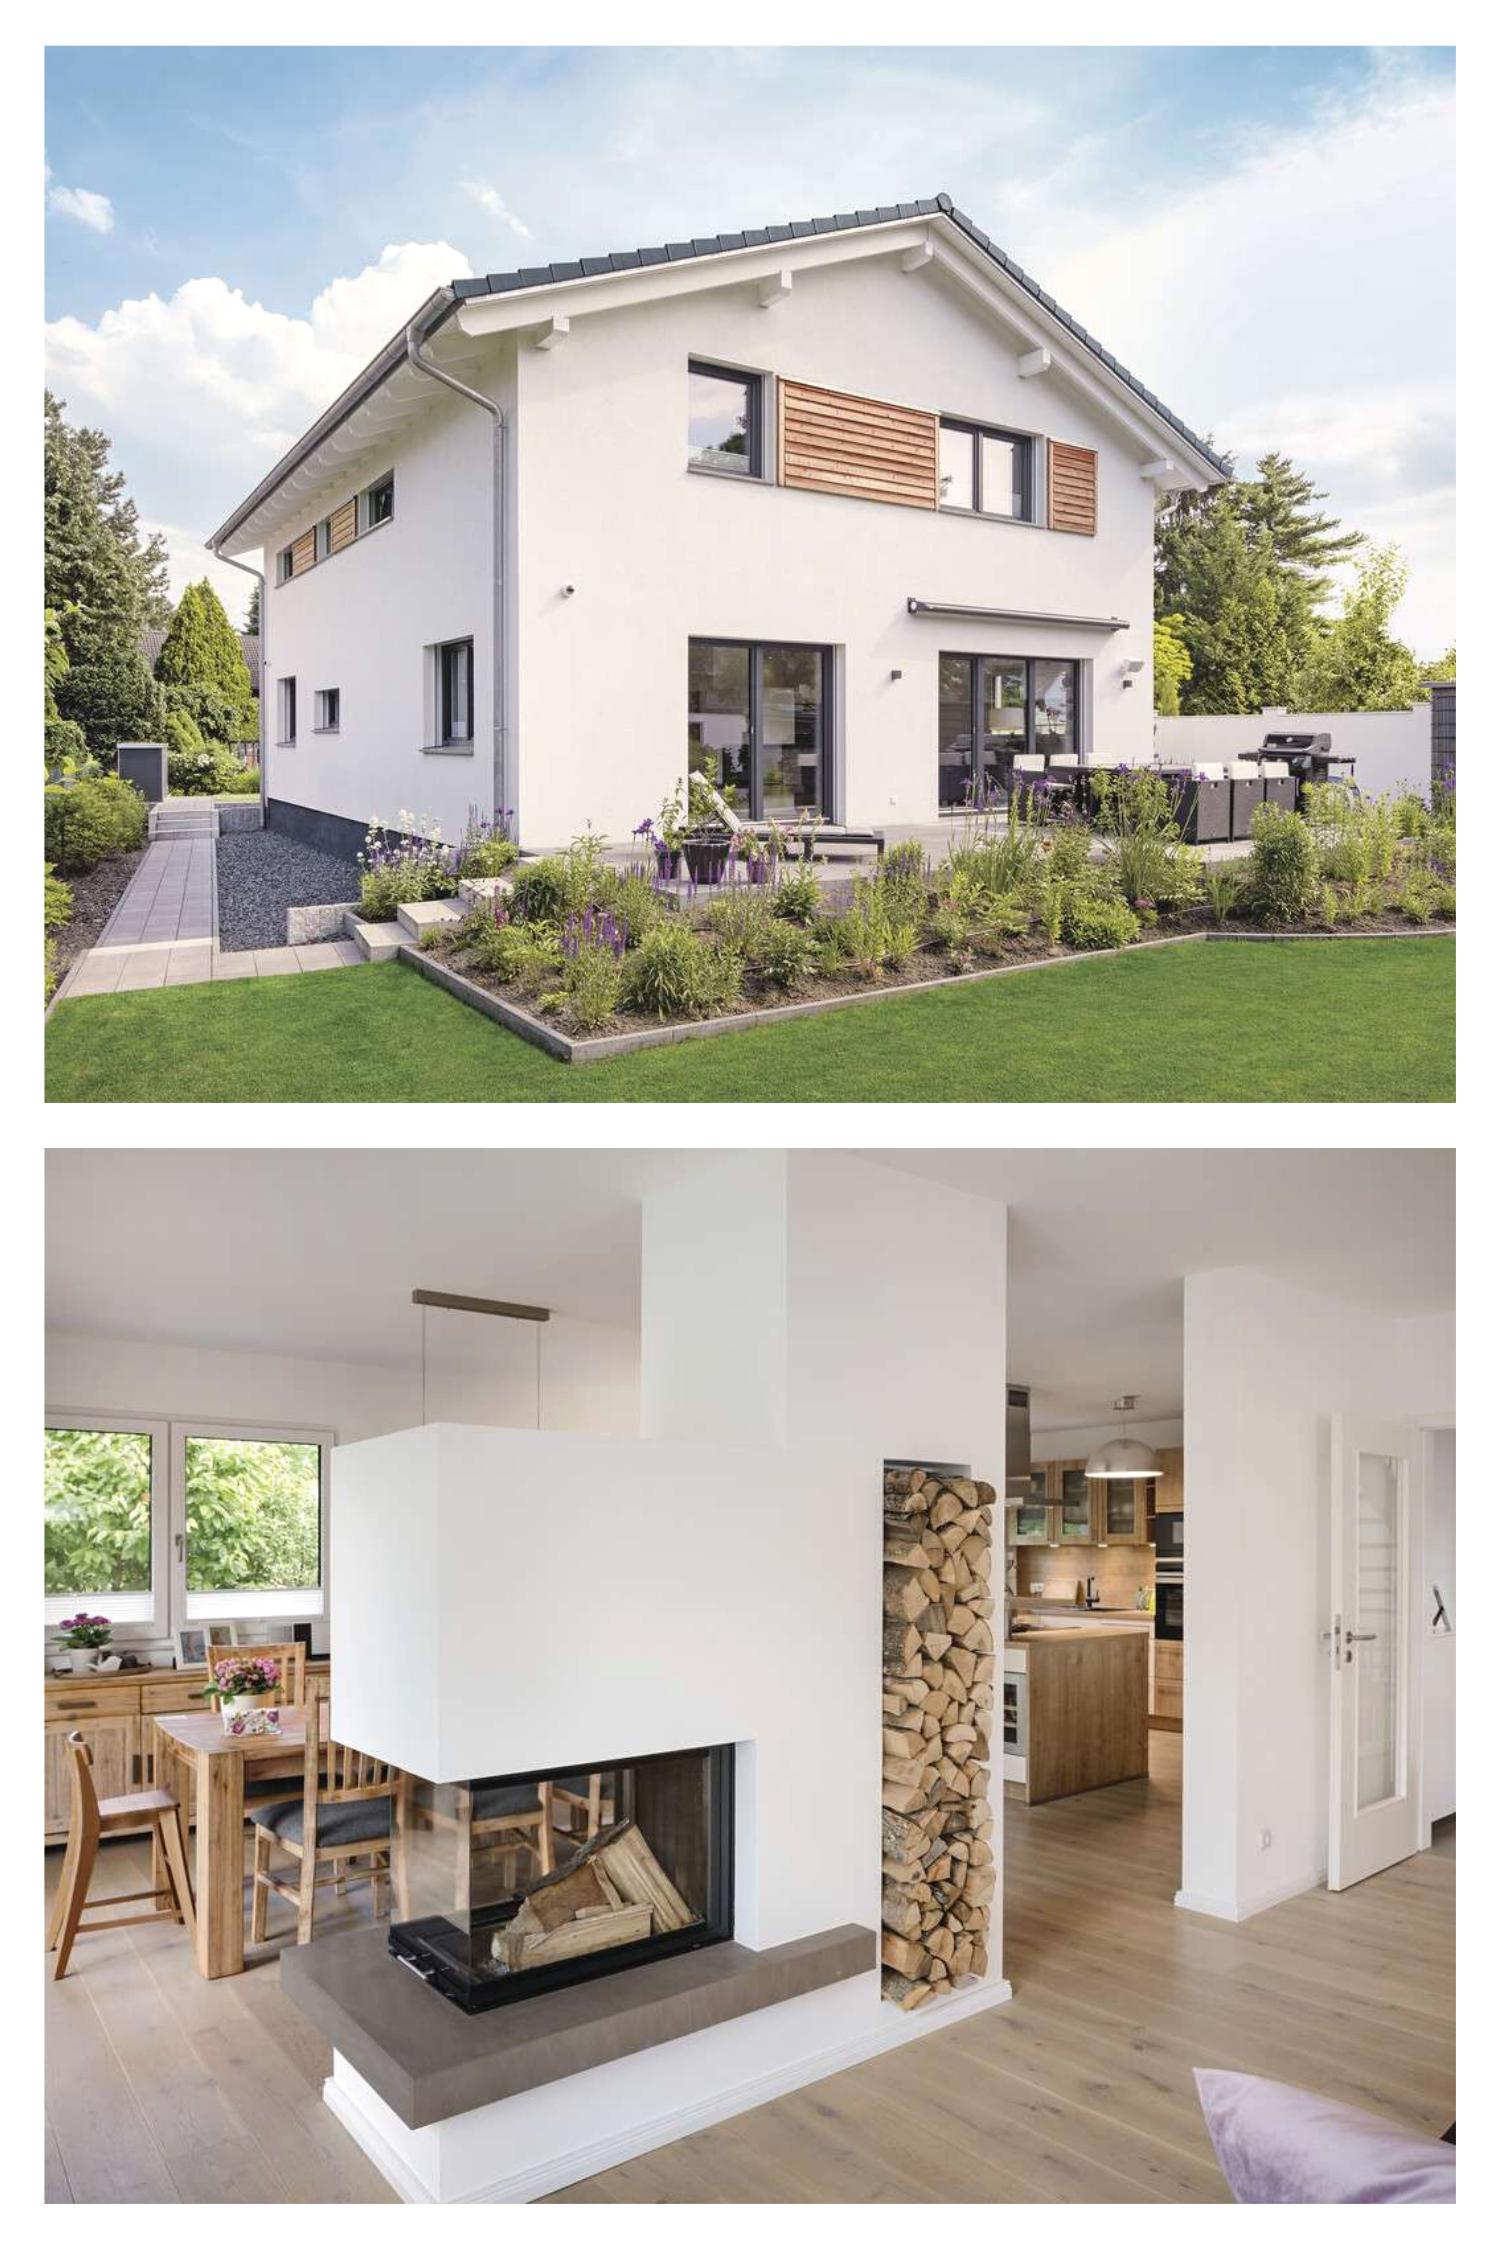 Einfamilienhaus frei geplant WeberHaus